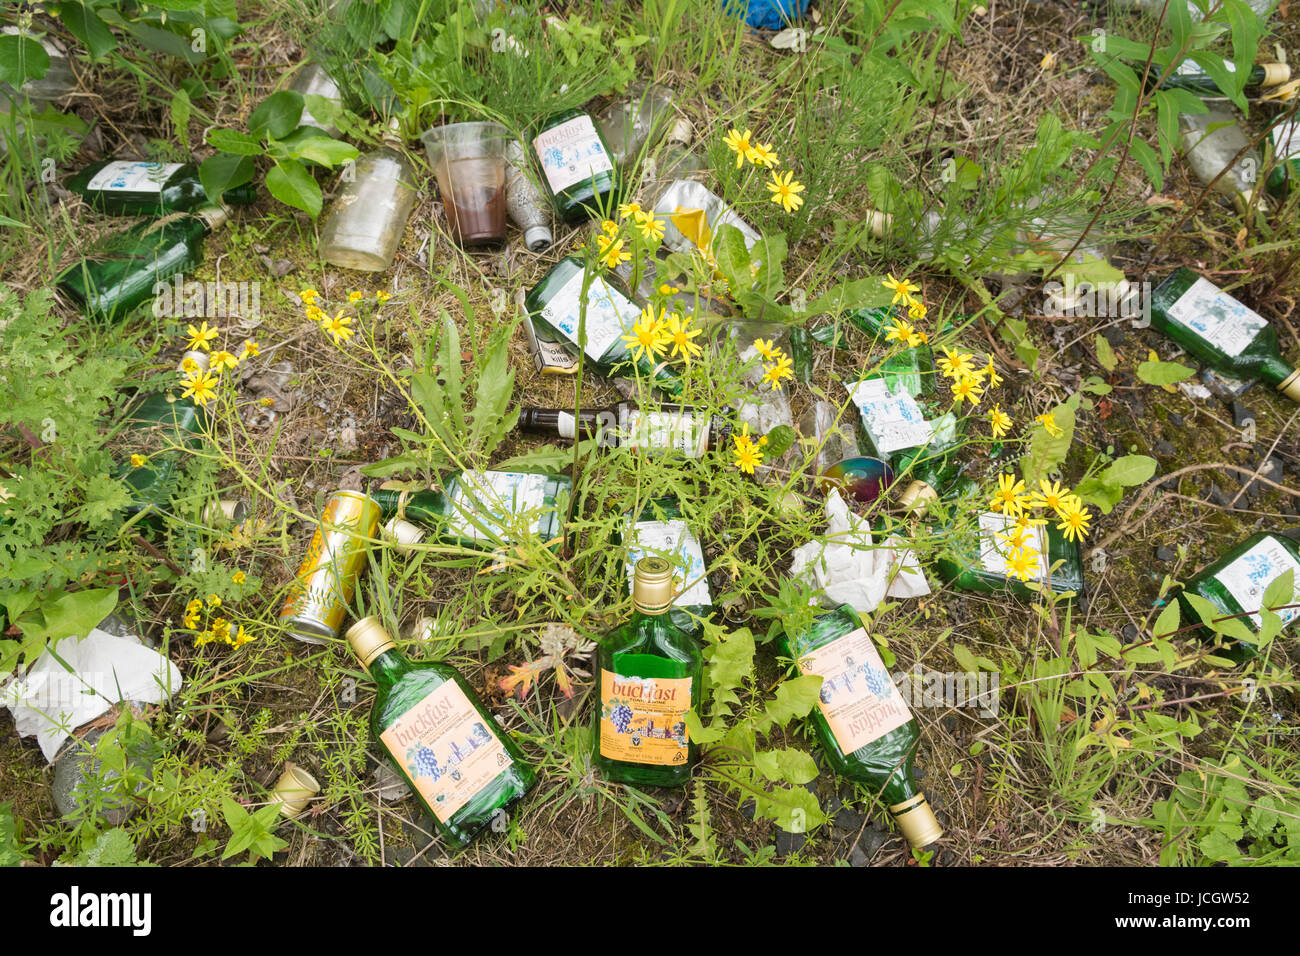 Buckfast Tonic Wine - empty bottles littering in Glasgow, Scotland, UK - Stock Image